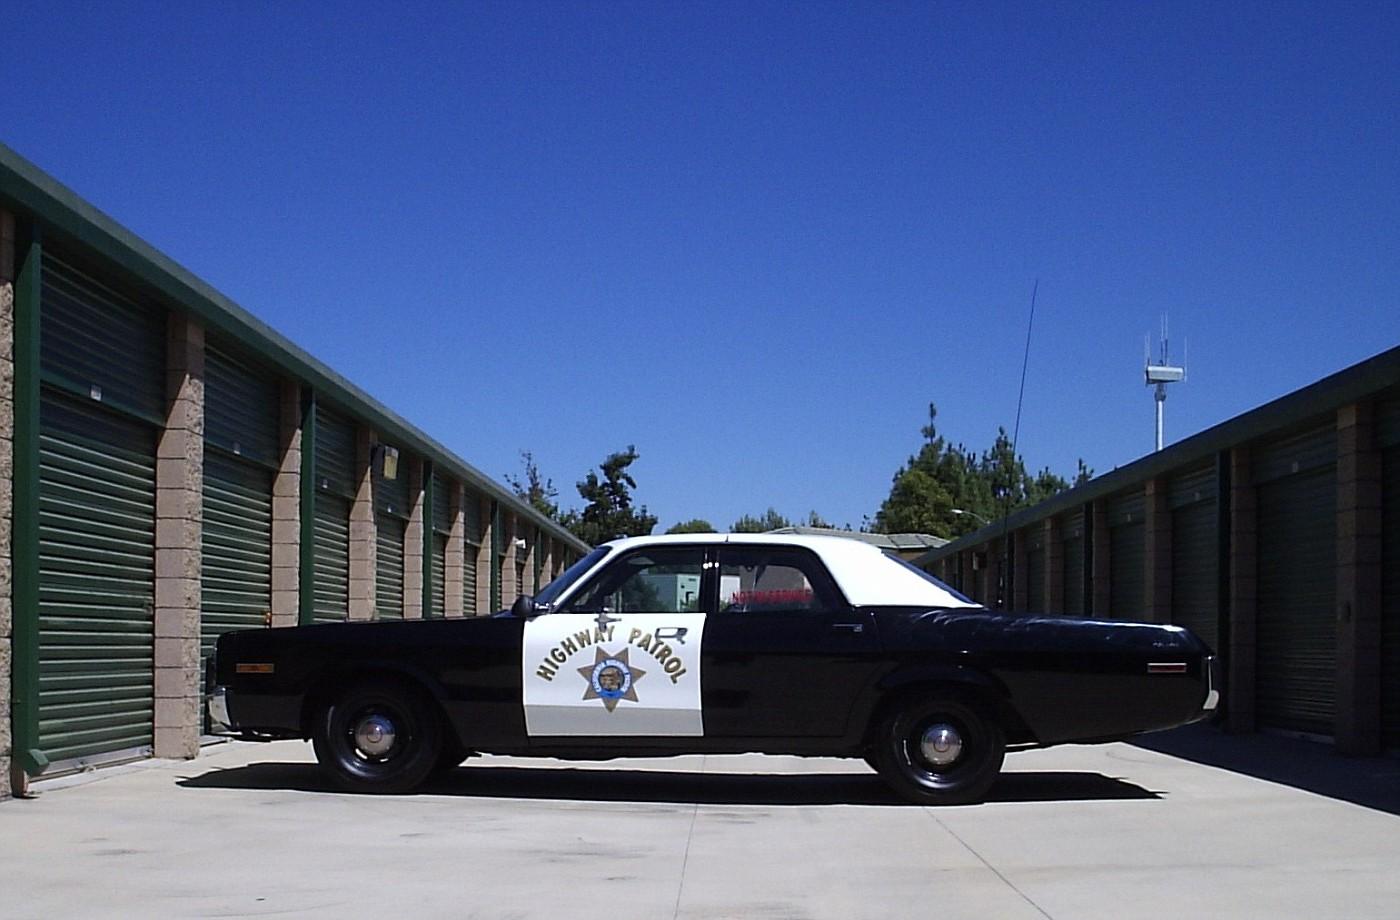 CA - California Hwy Patrol